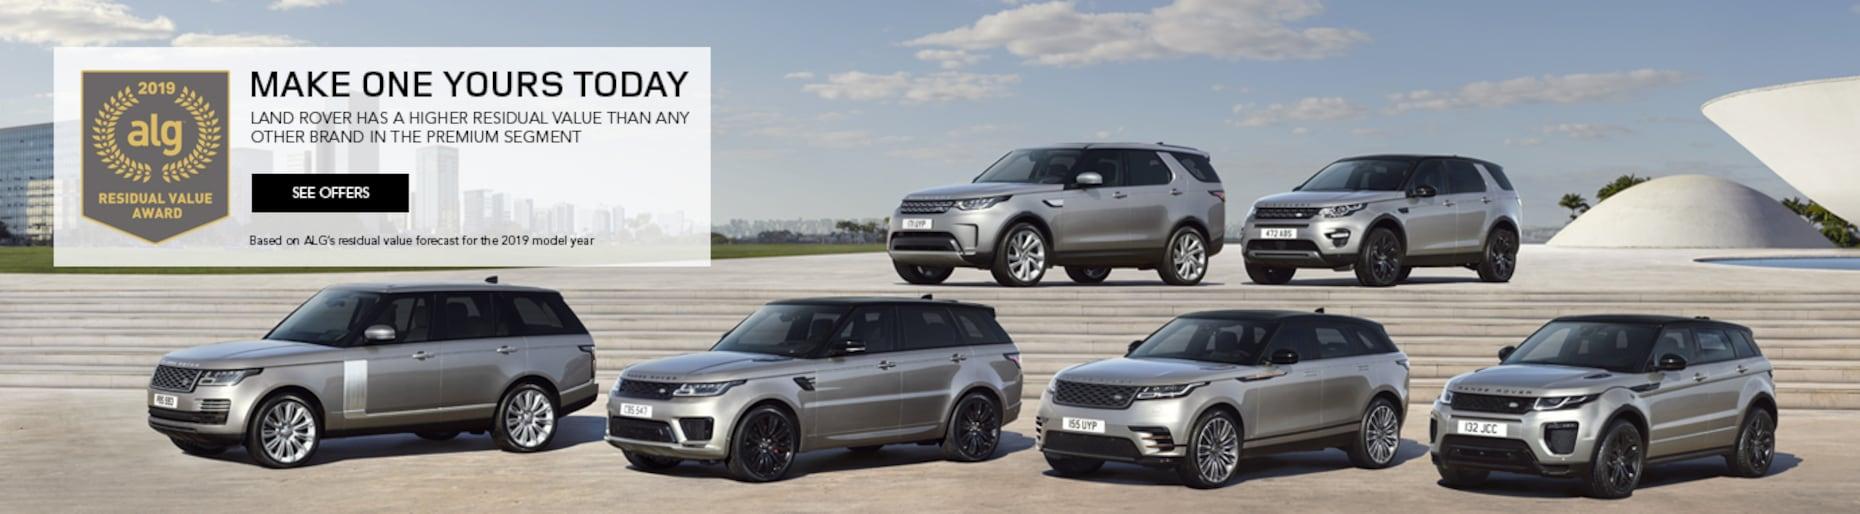 Land Rover Dealership >> Land Rover Rockford New Land Rover Dealership In Rockford Il